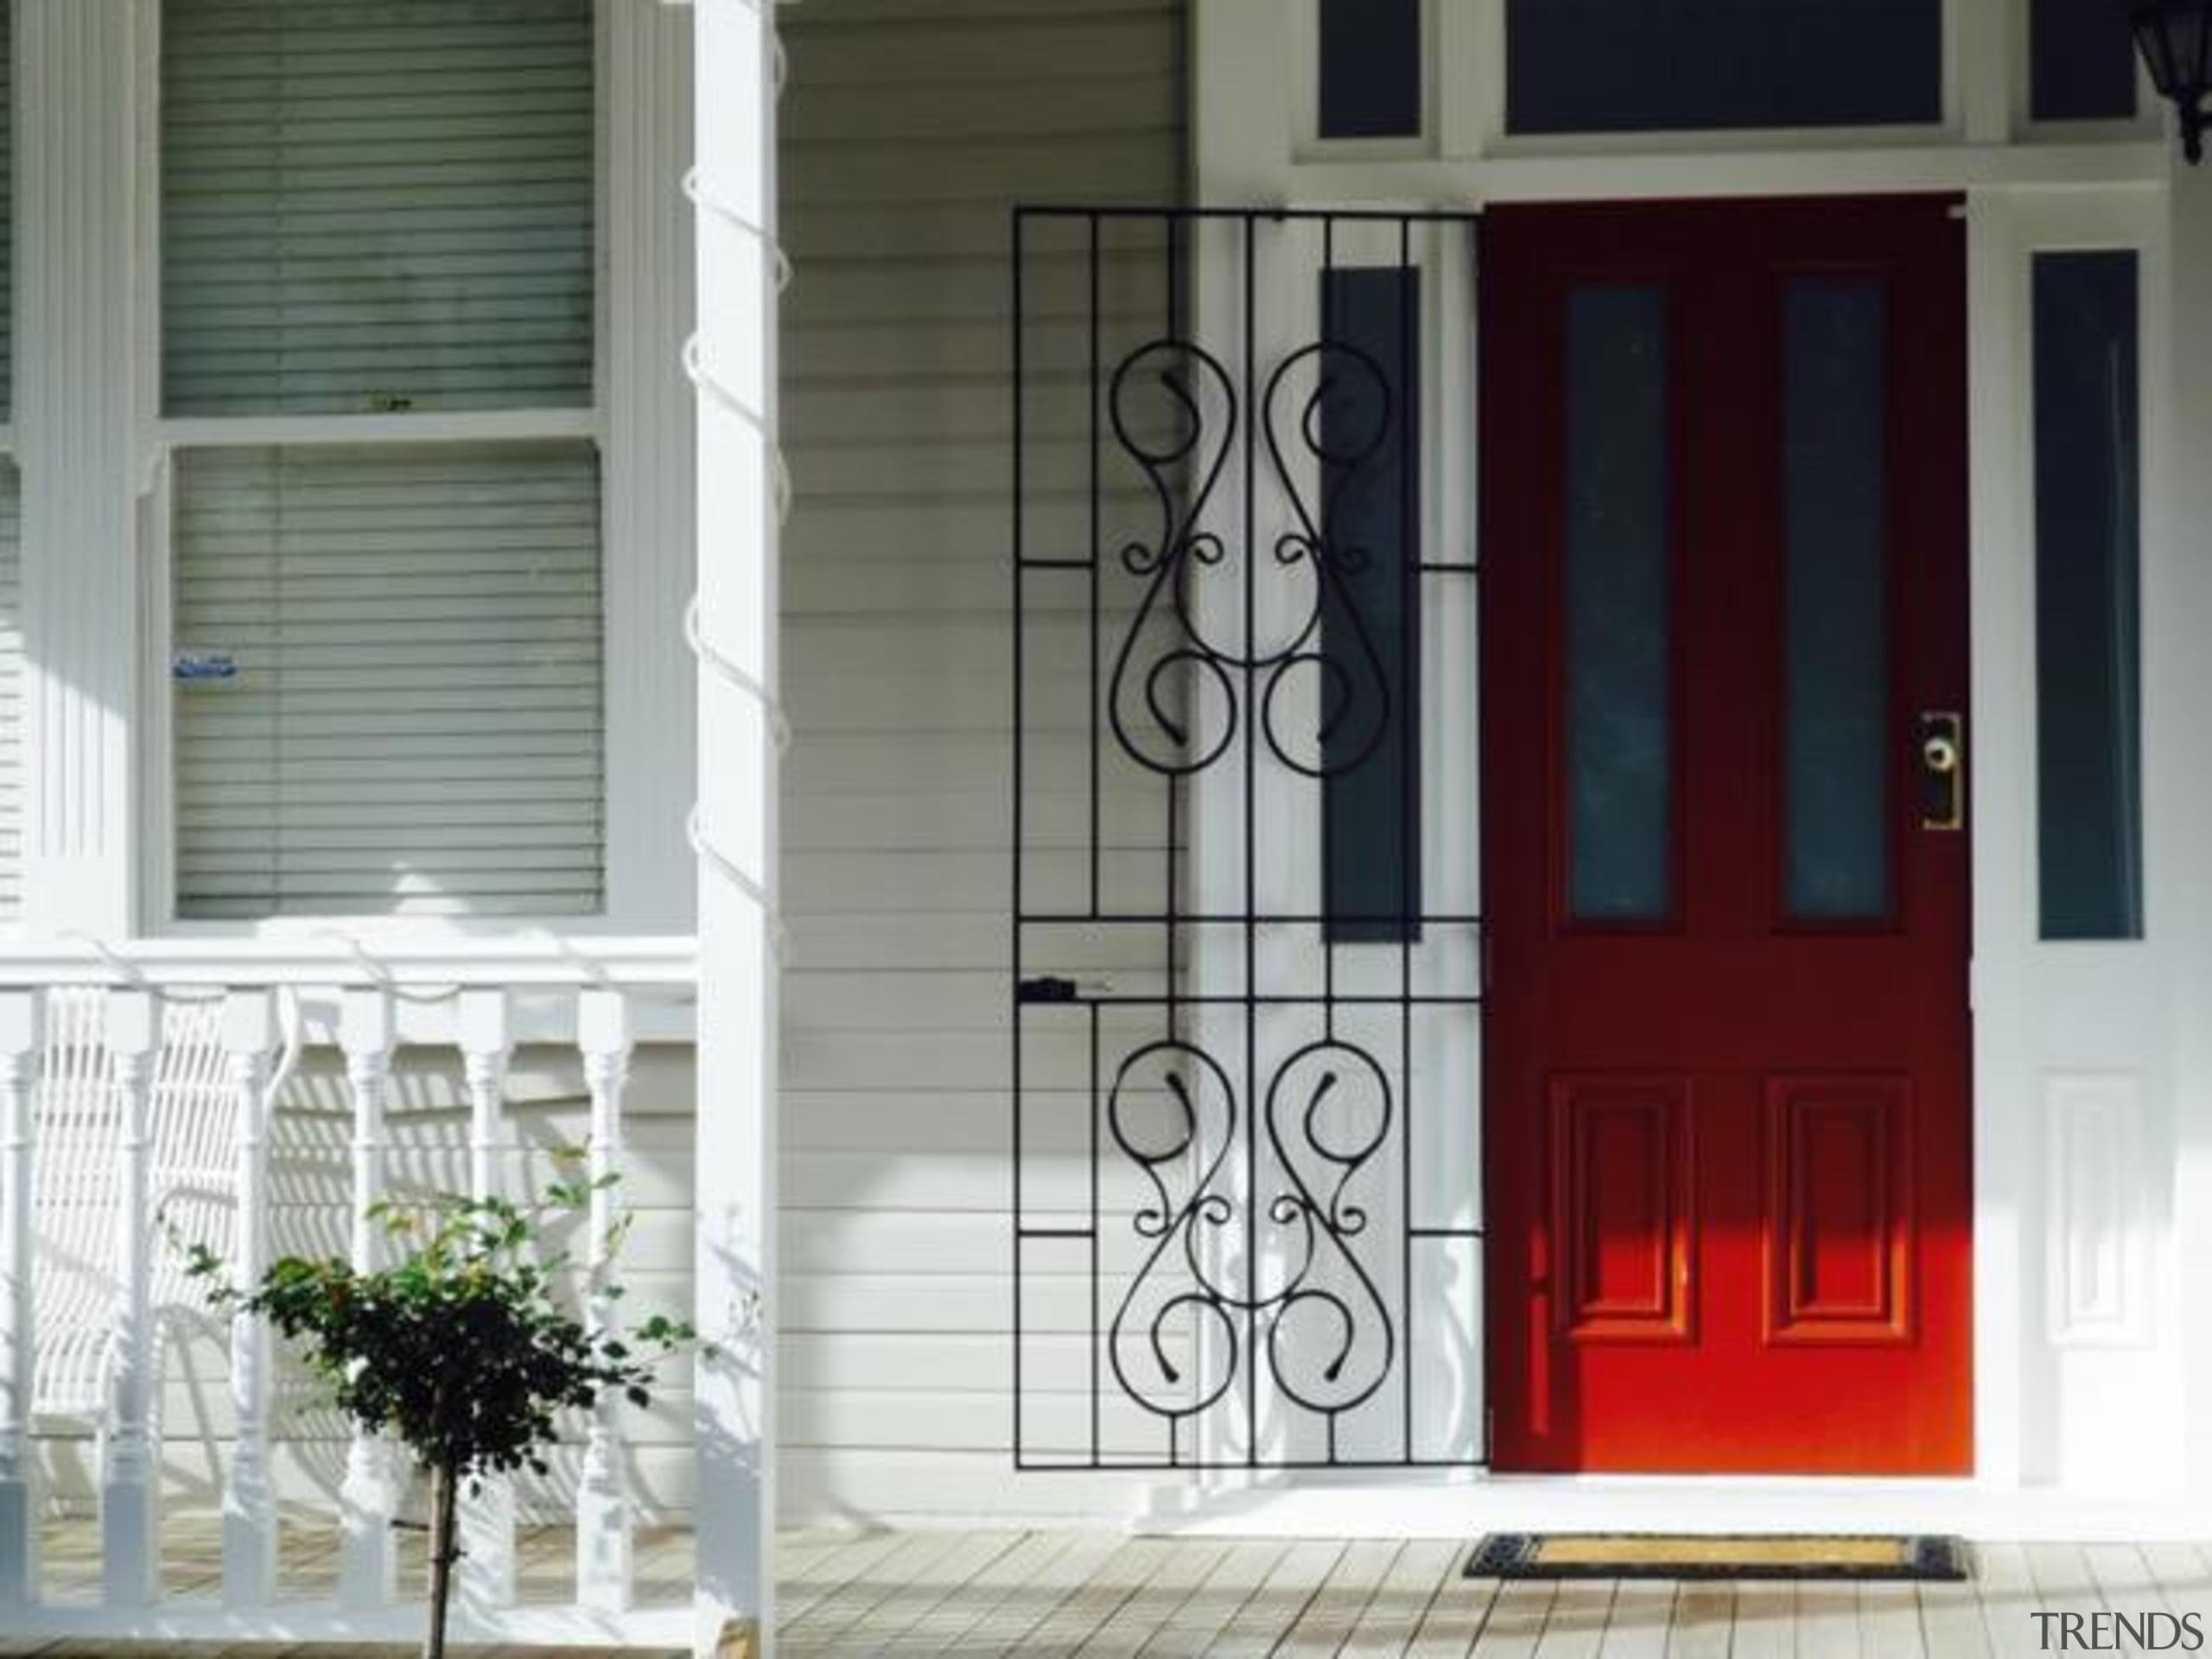 grange view road enhanced.jpeg - grange_view_road_enhanced.jpeg - architecture architecture, door, facade, gate, home, house, iron, porch, screen door, structure, window, gray, white